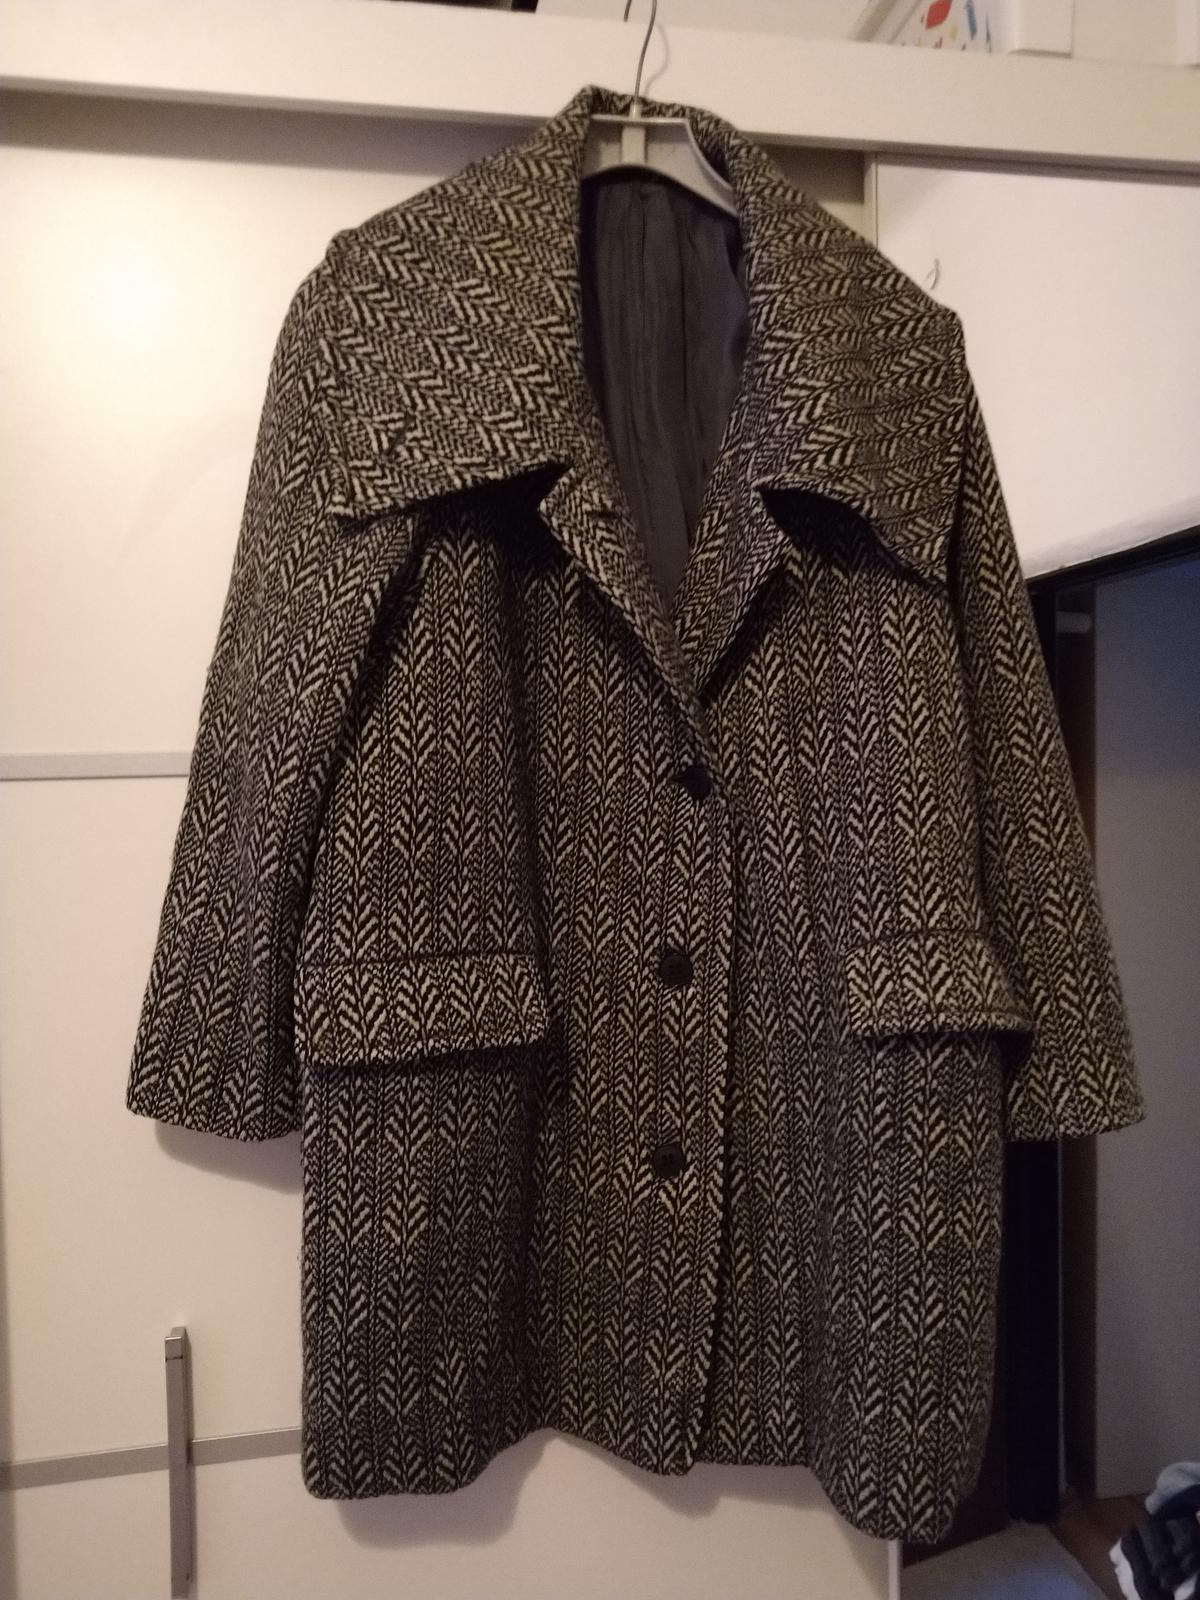 Čiernobiely kabát c.50 - Obrázok č. 4